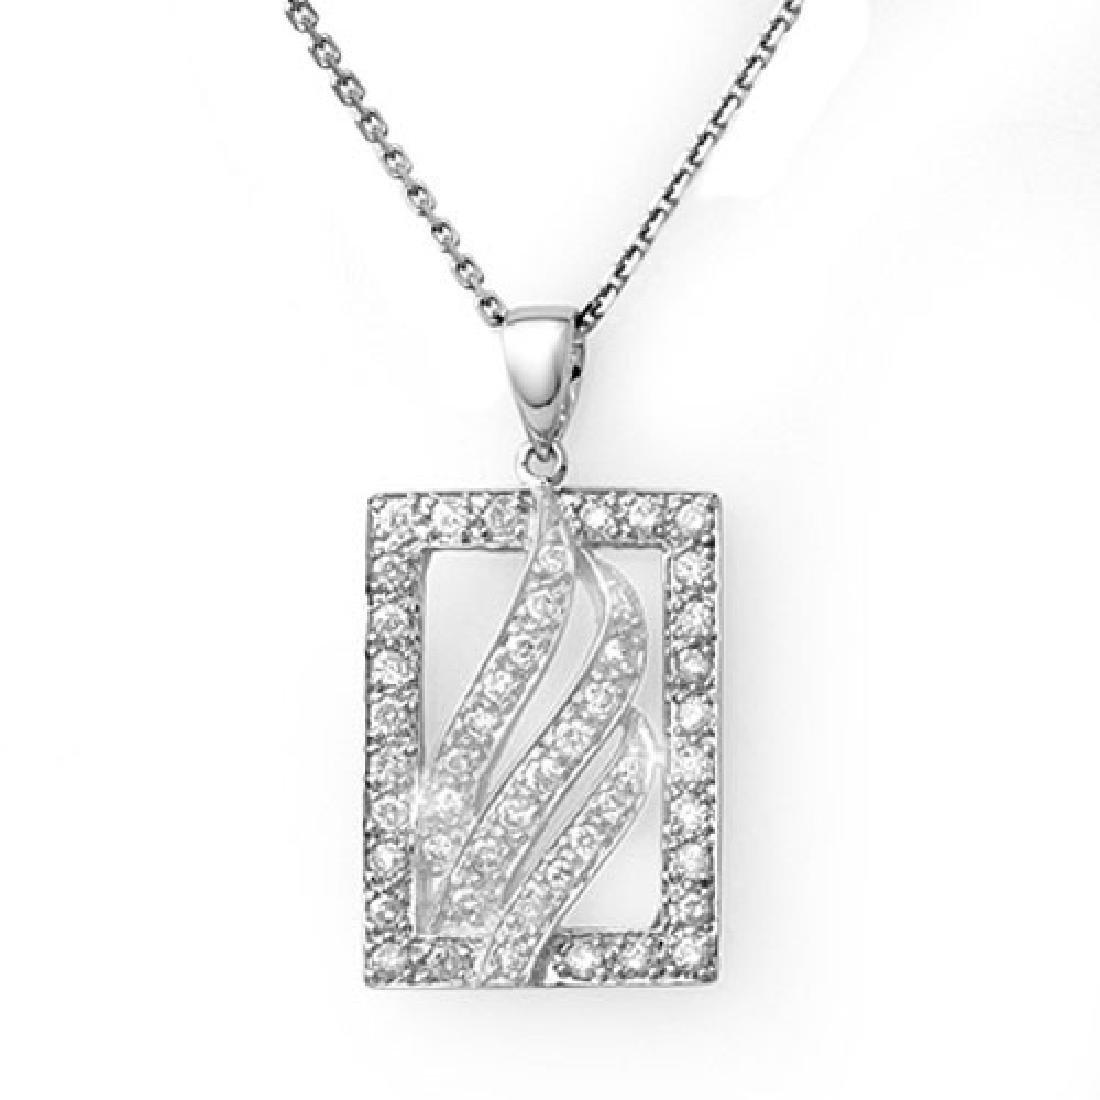 0.45 CTW Certified VS/SI Diamond Necklace 18K White